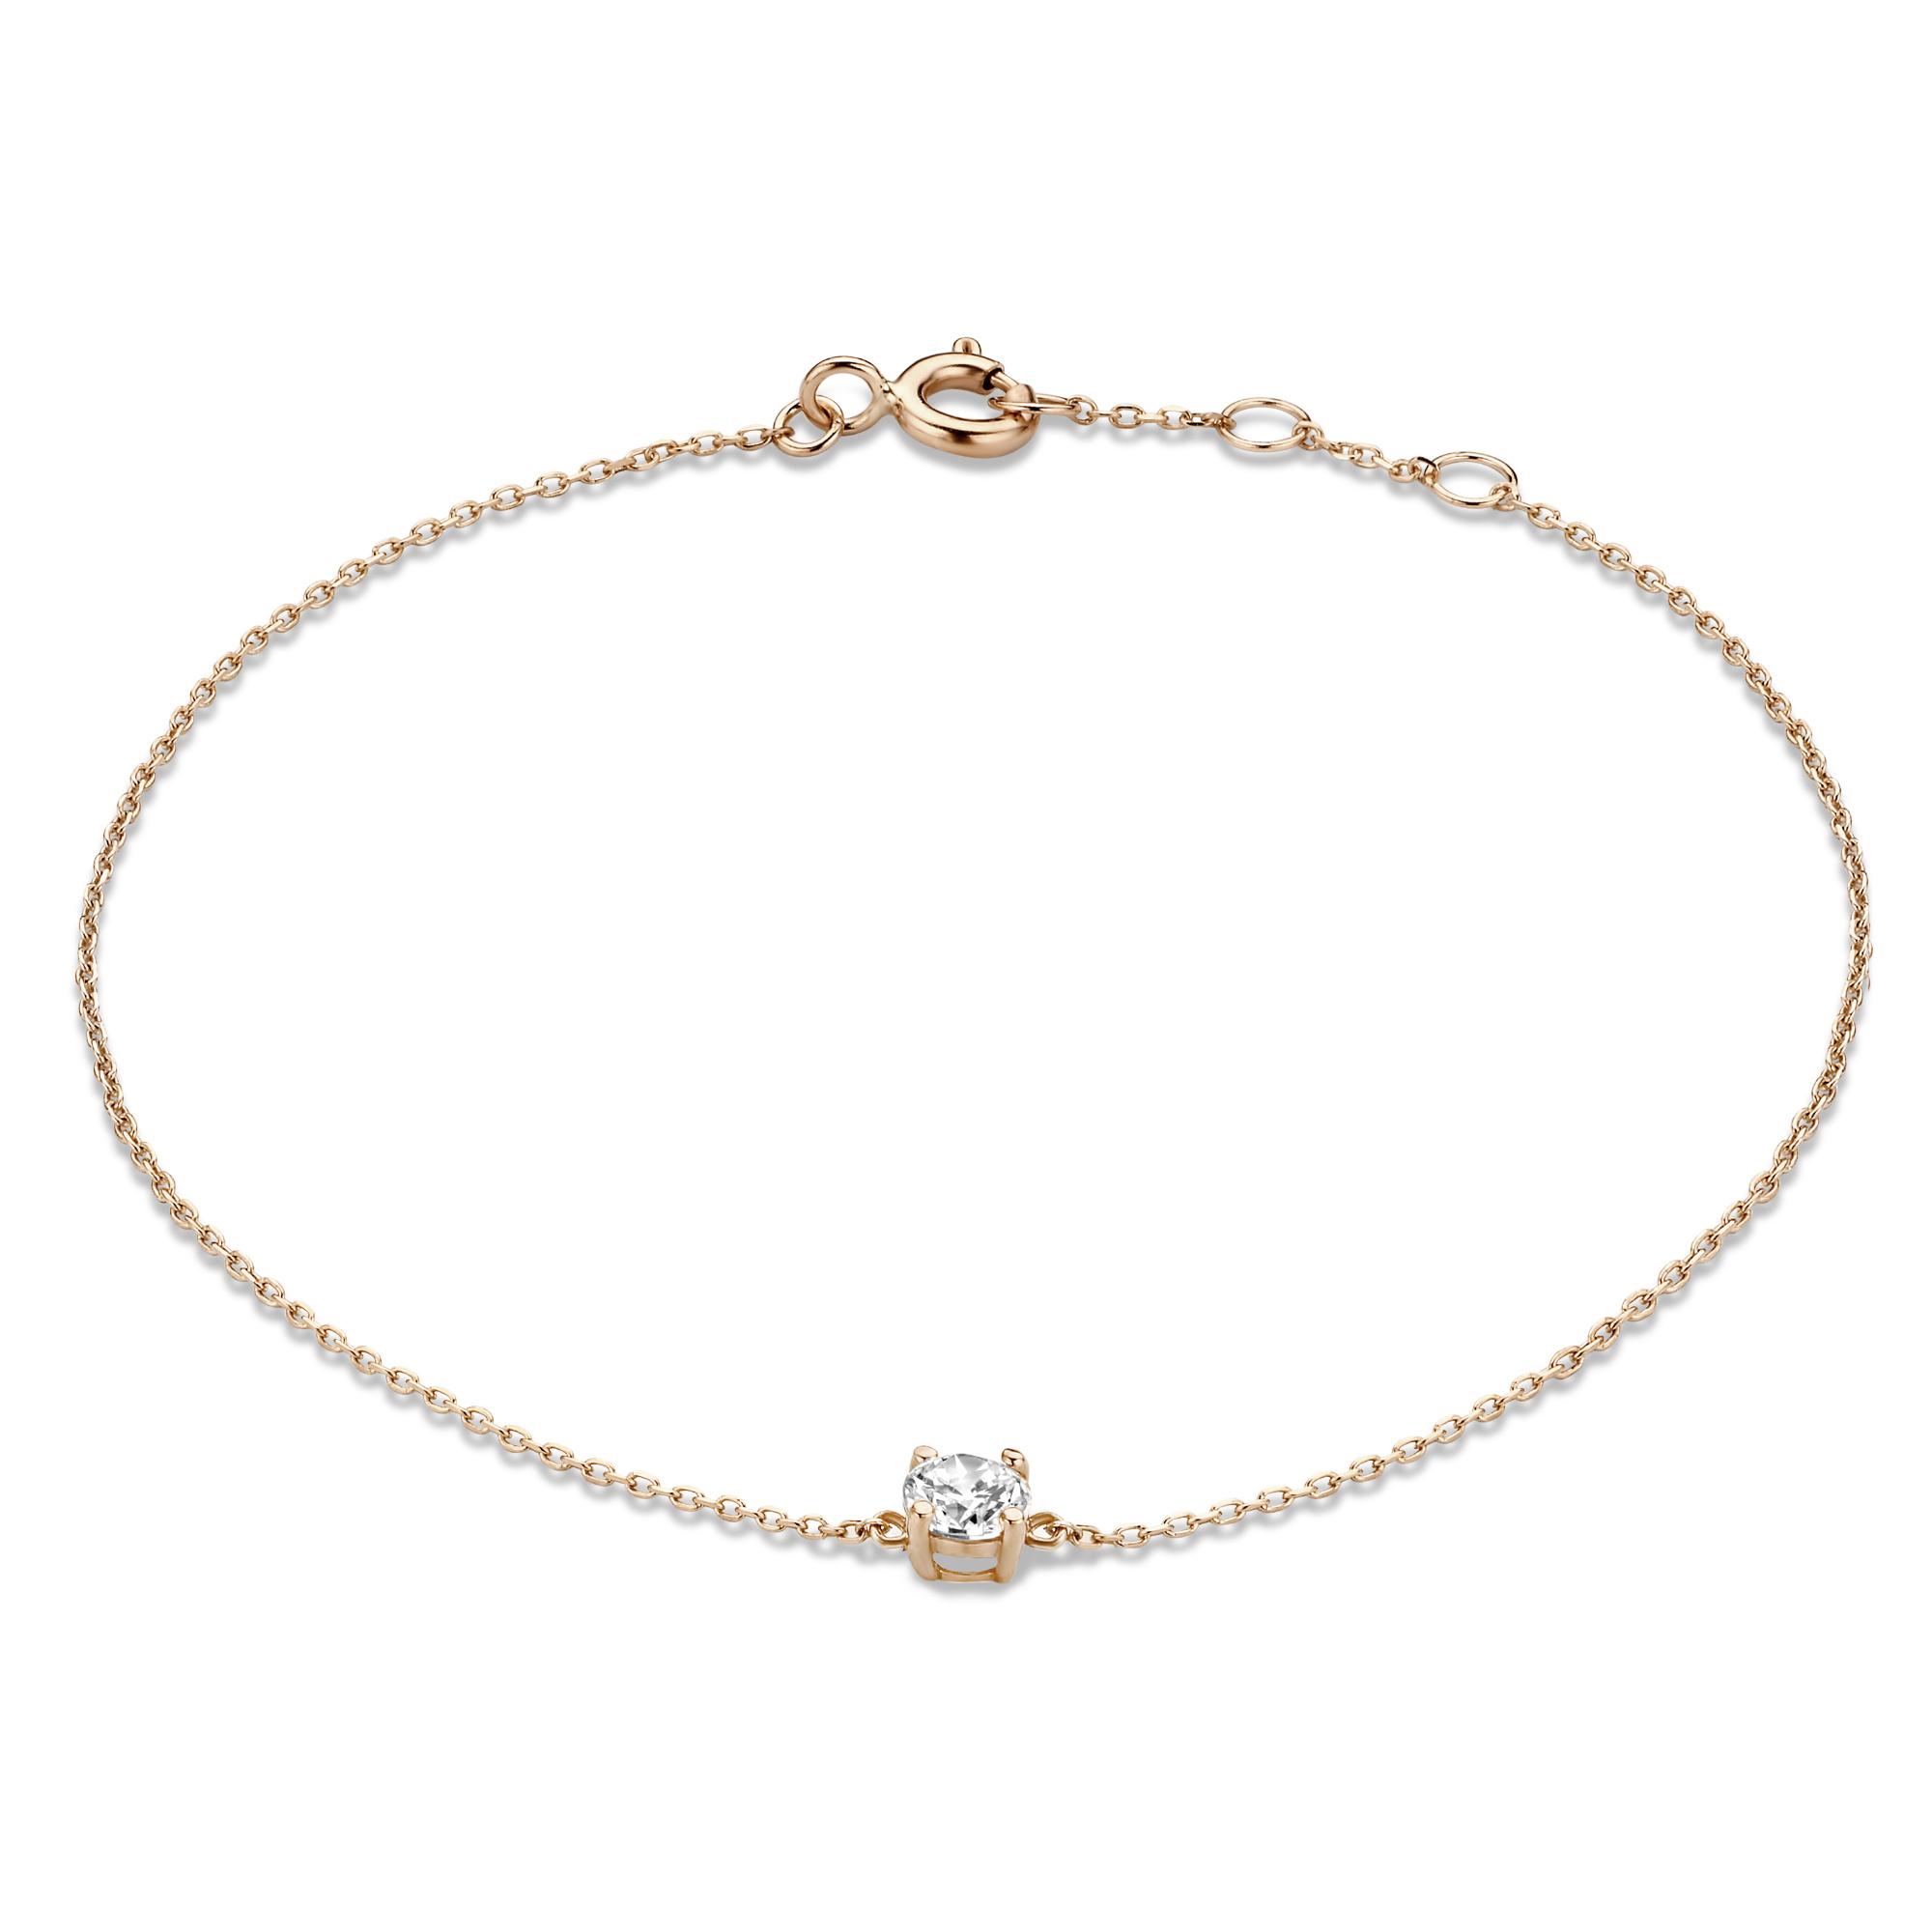 Isabel Bernard La Concorde Apolline bracelet en or rose 14 carats